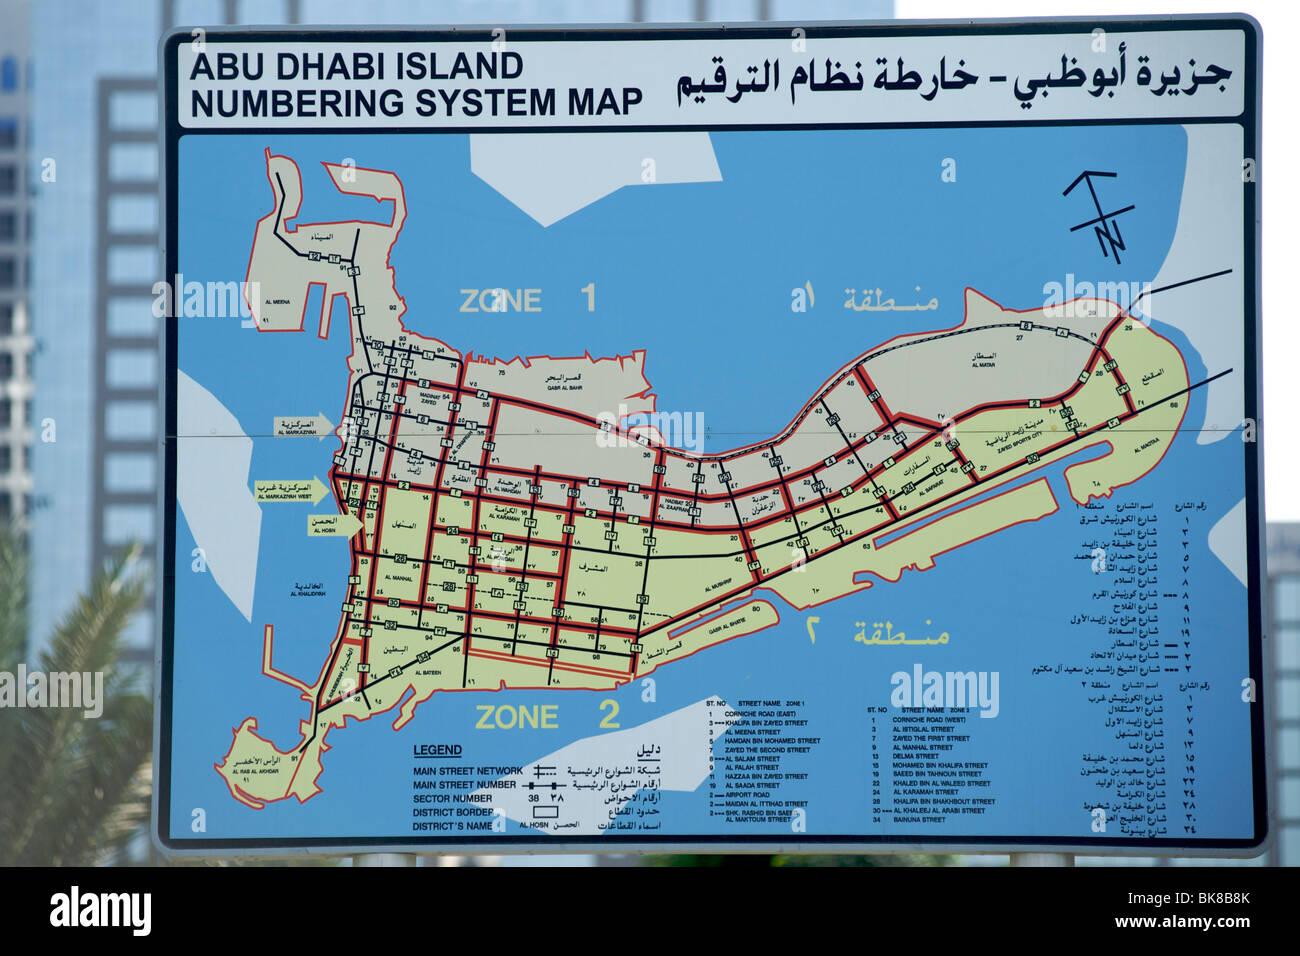 Map Abu Dhabi Stockfotos & Map Abu Dhabi Bilder - Alamy